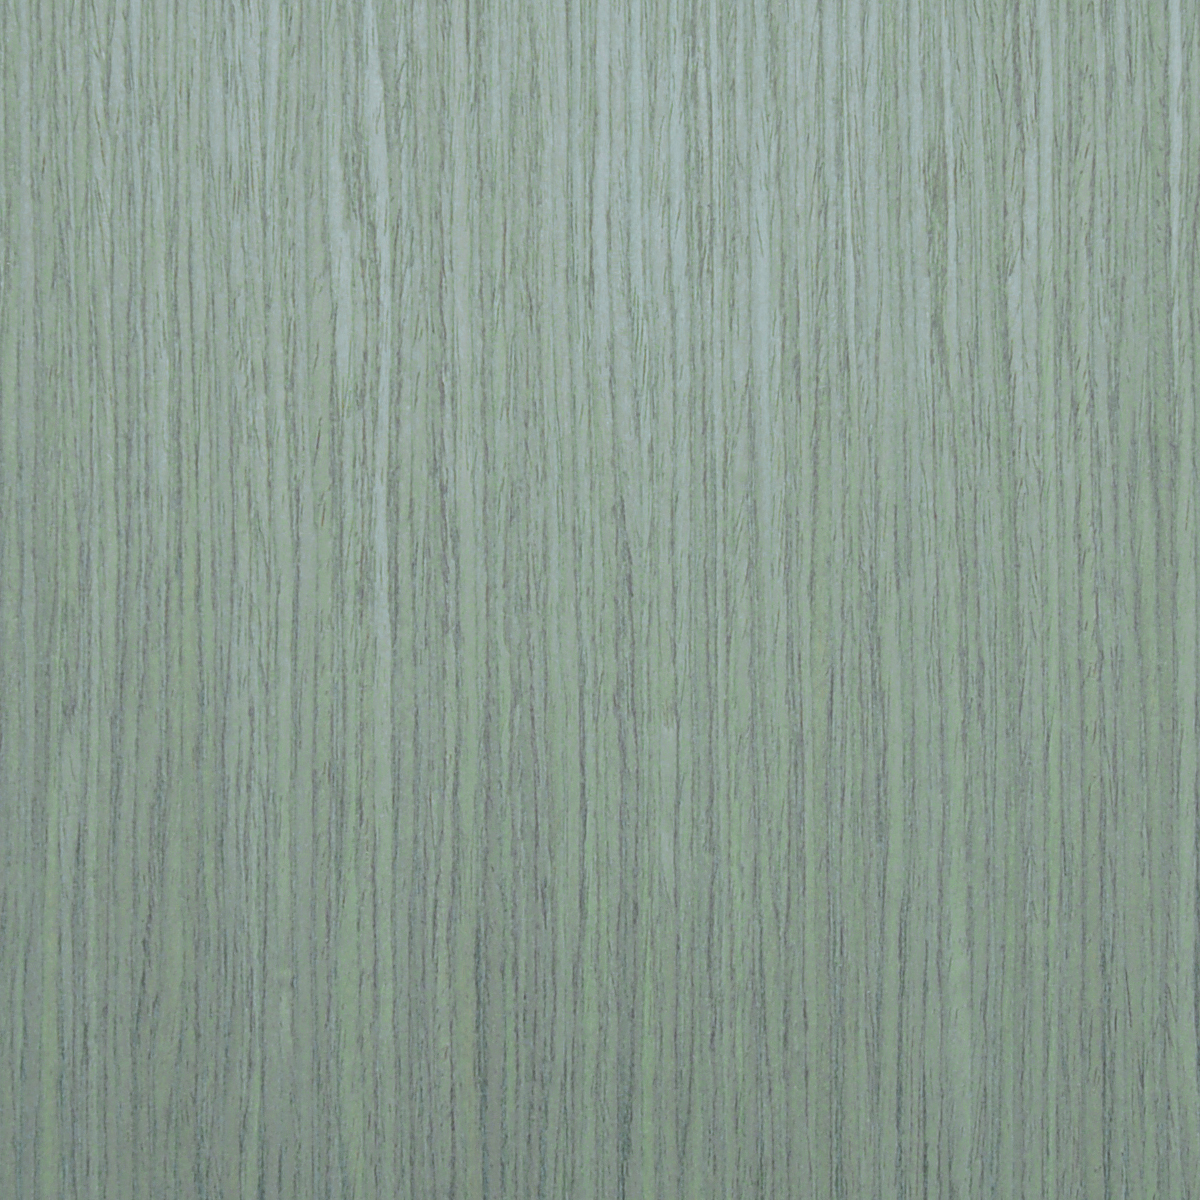 Grey Oak Straight Unfinished